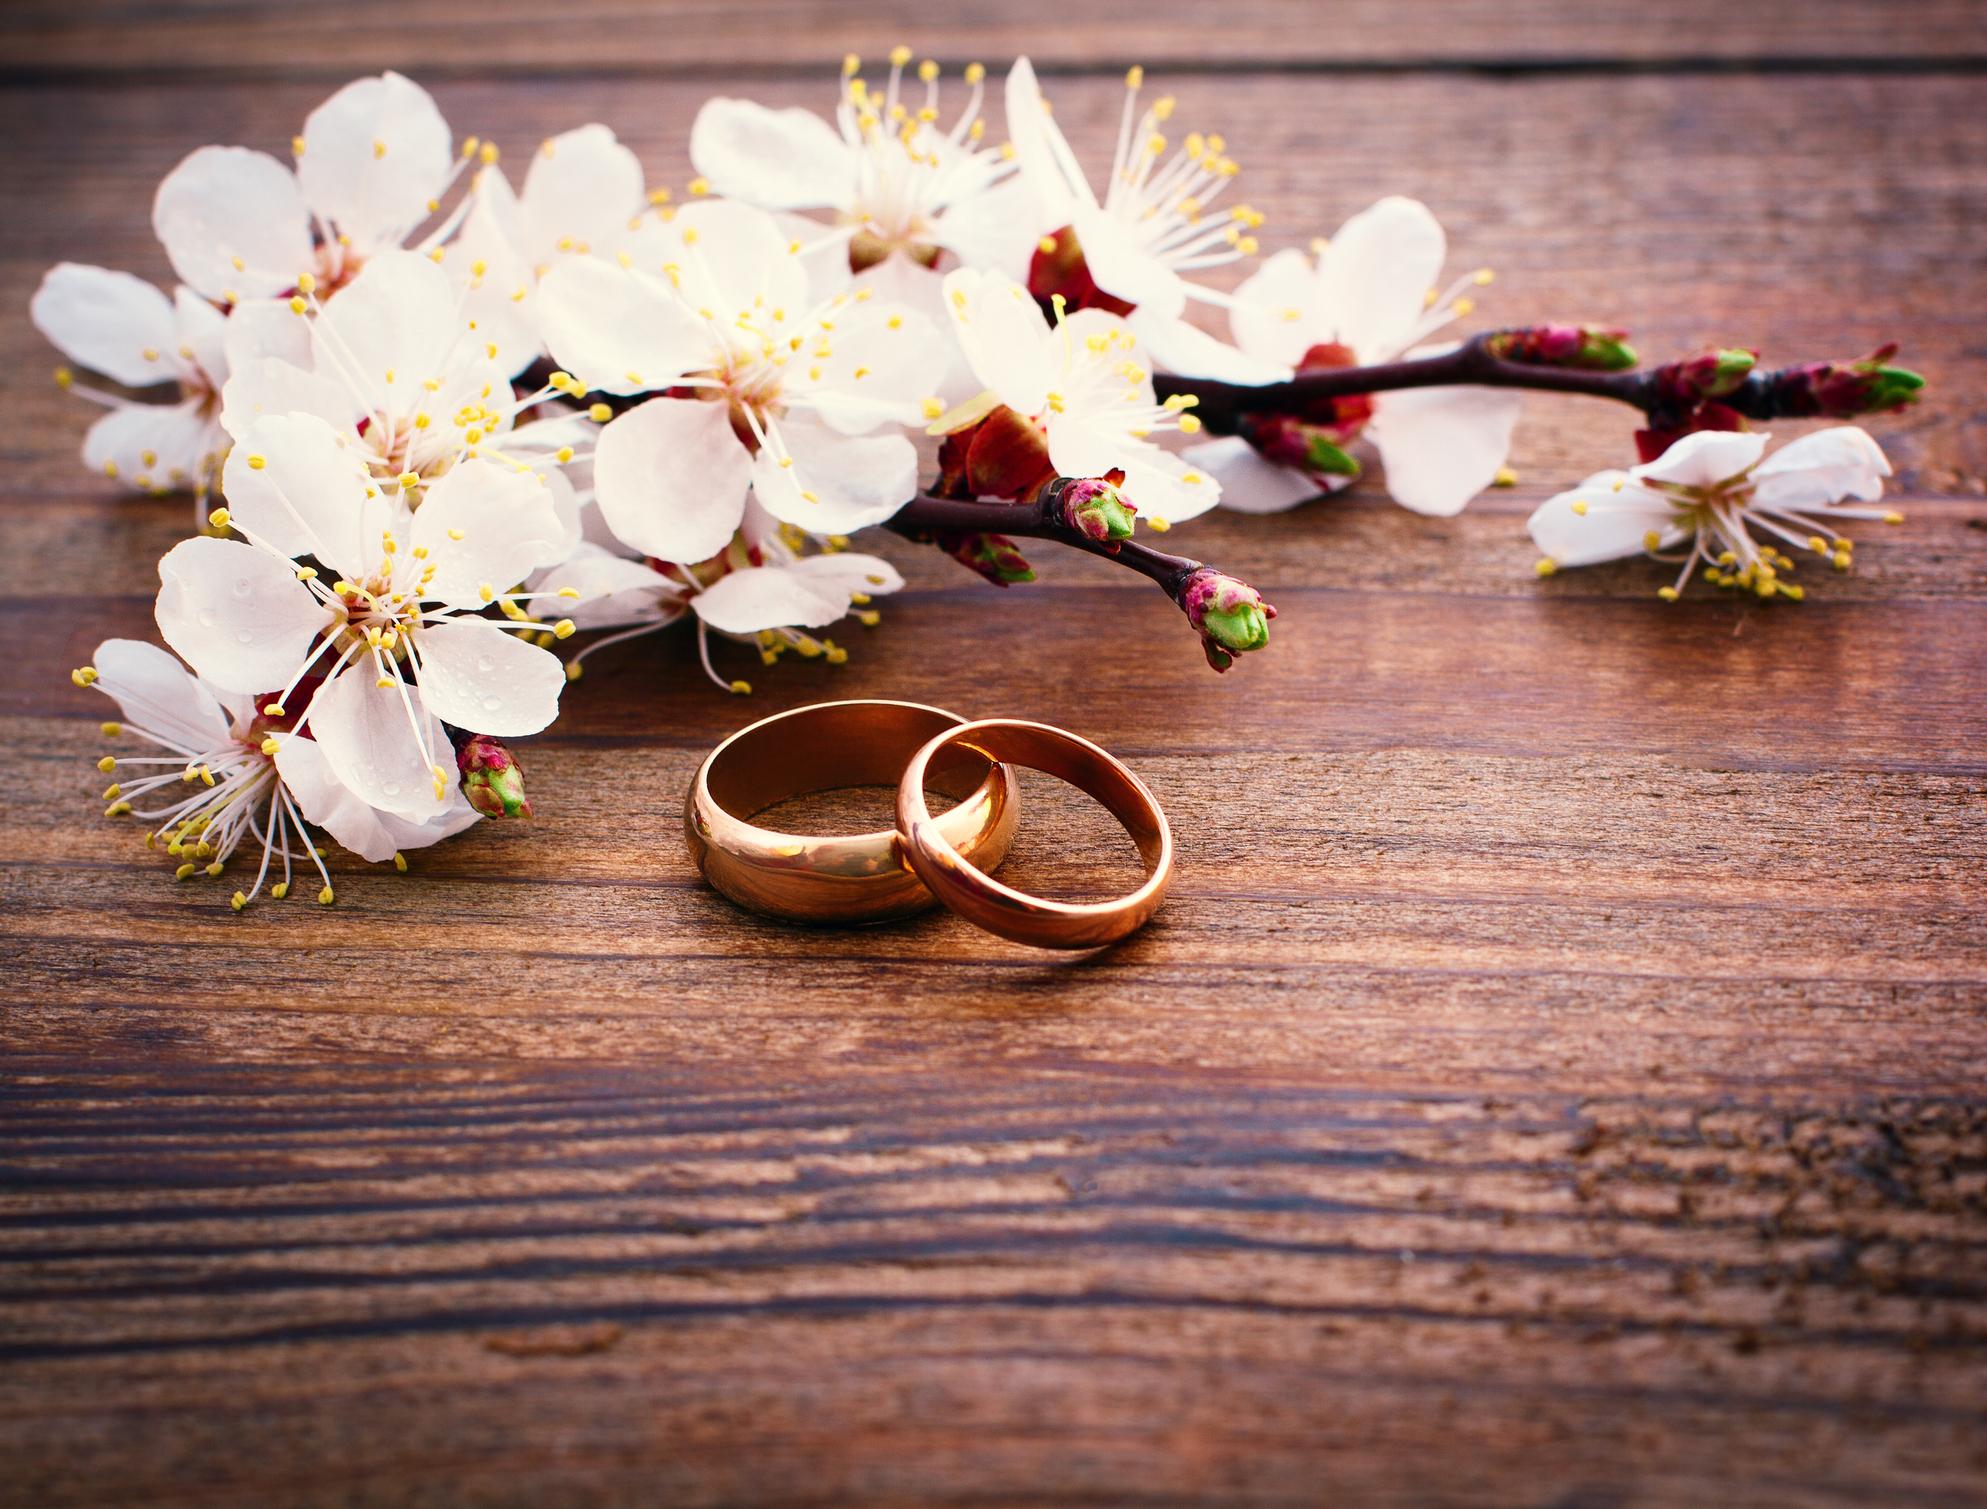 Hochzeitstage Fotograf Neuruppin Adina Lars Fotografieren